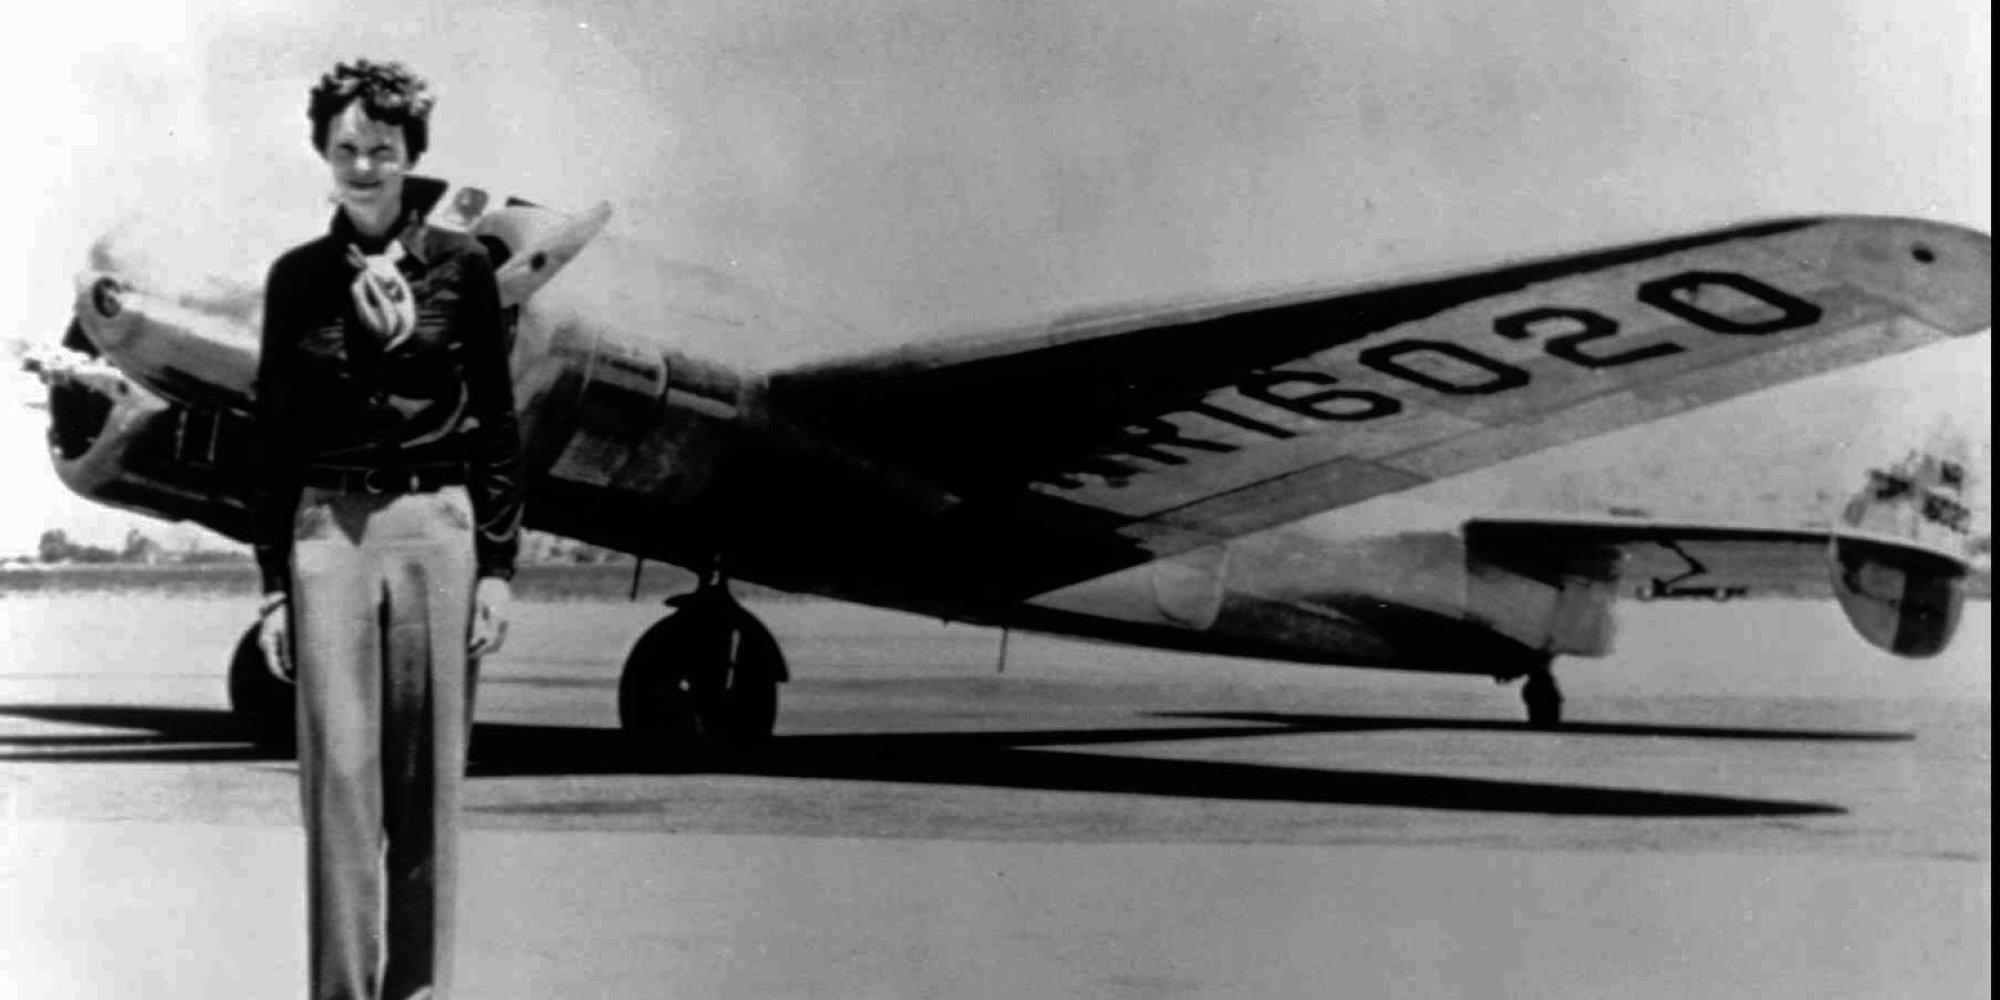 Amelia beside the Electra Plane